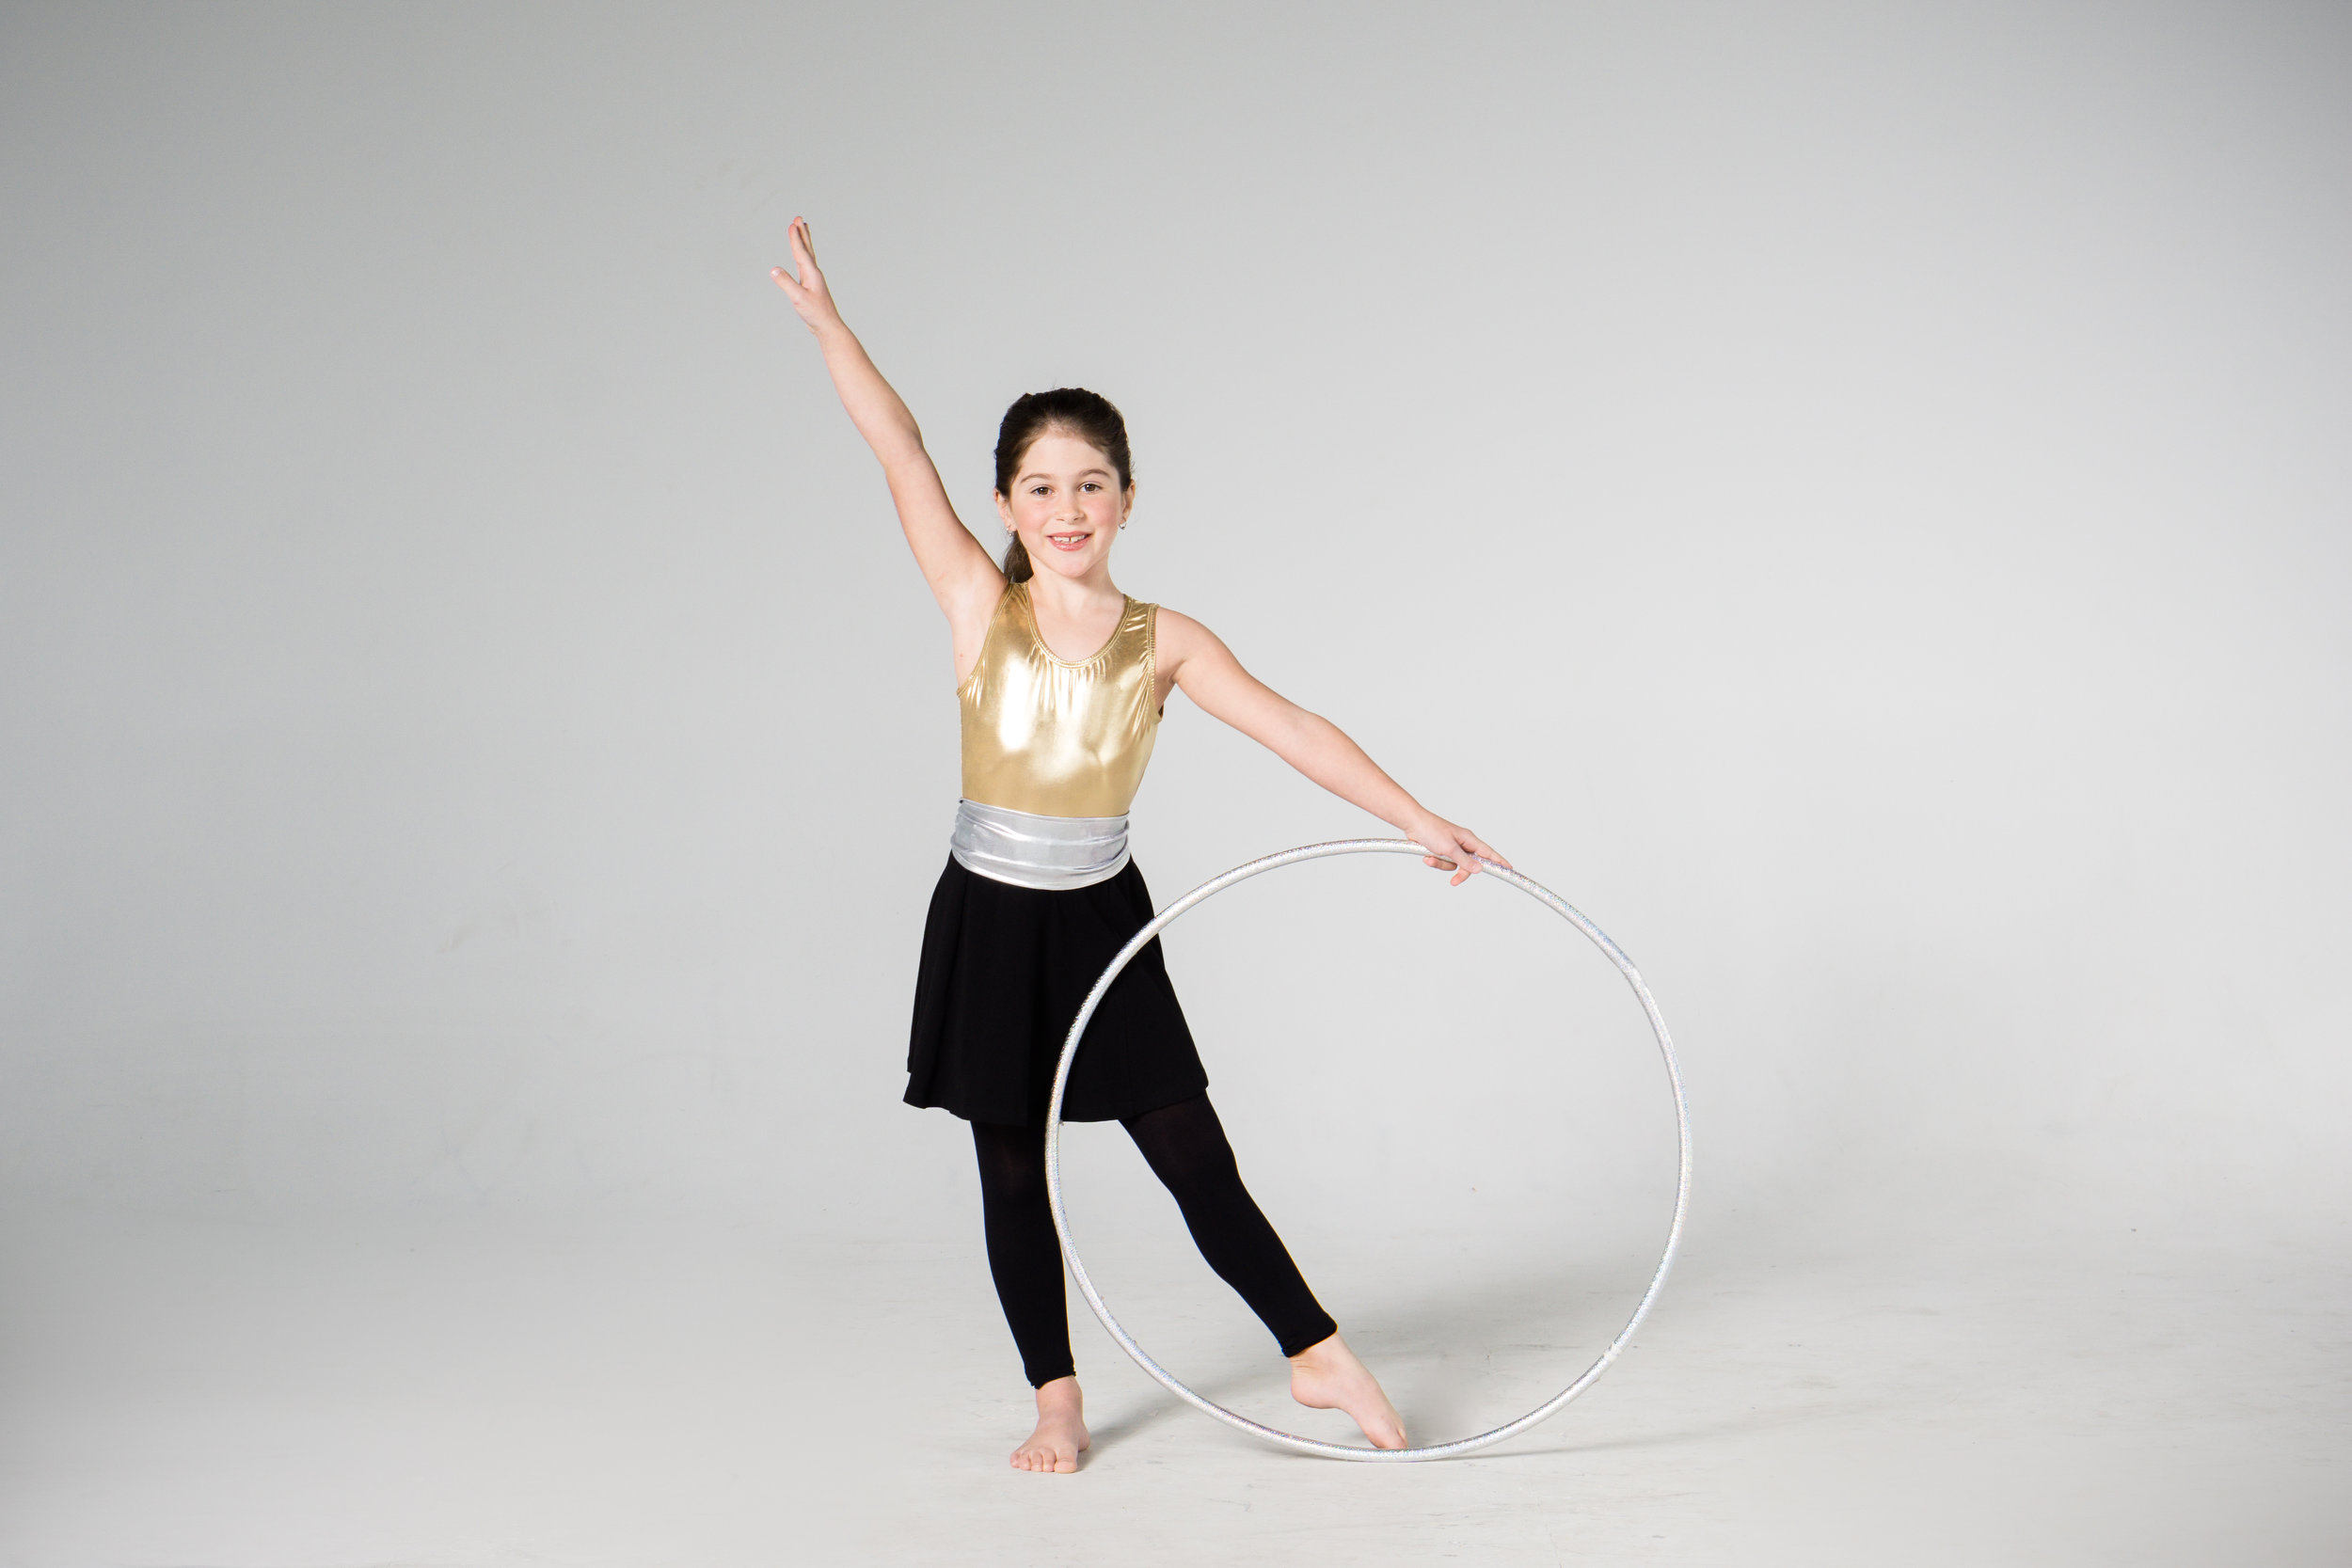 young rhythmic gymnastics girl with hoop